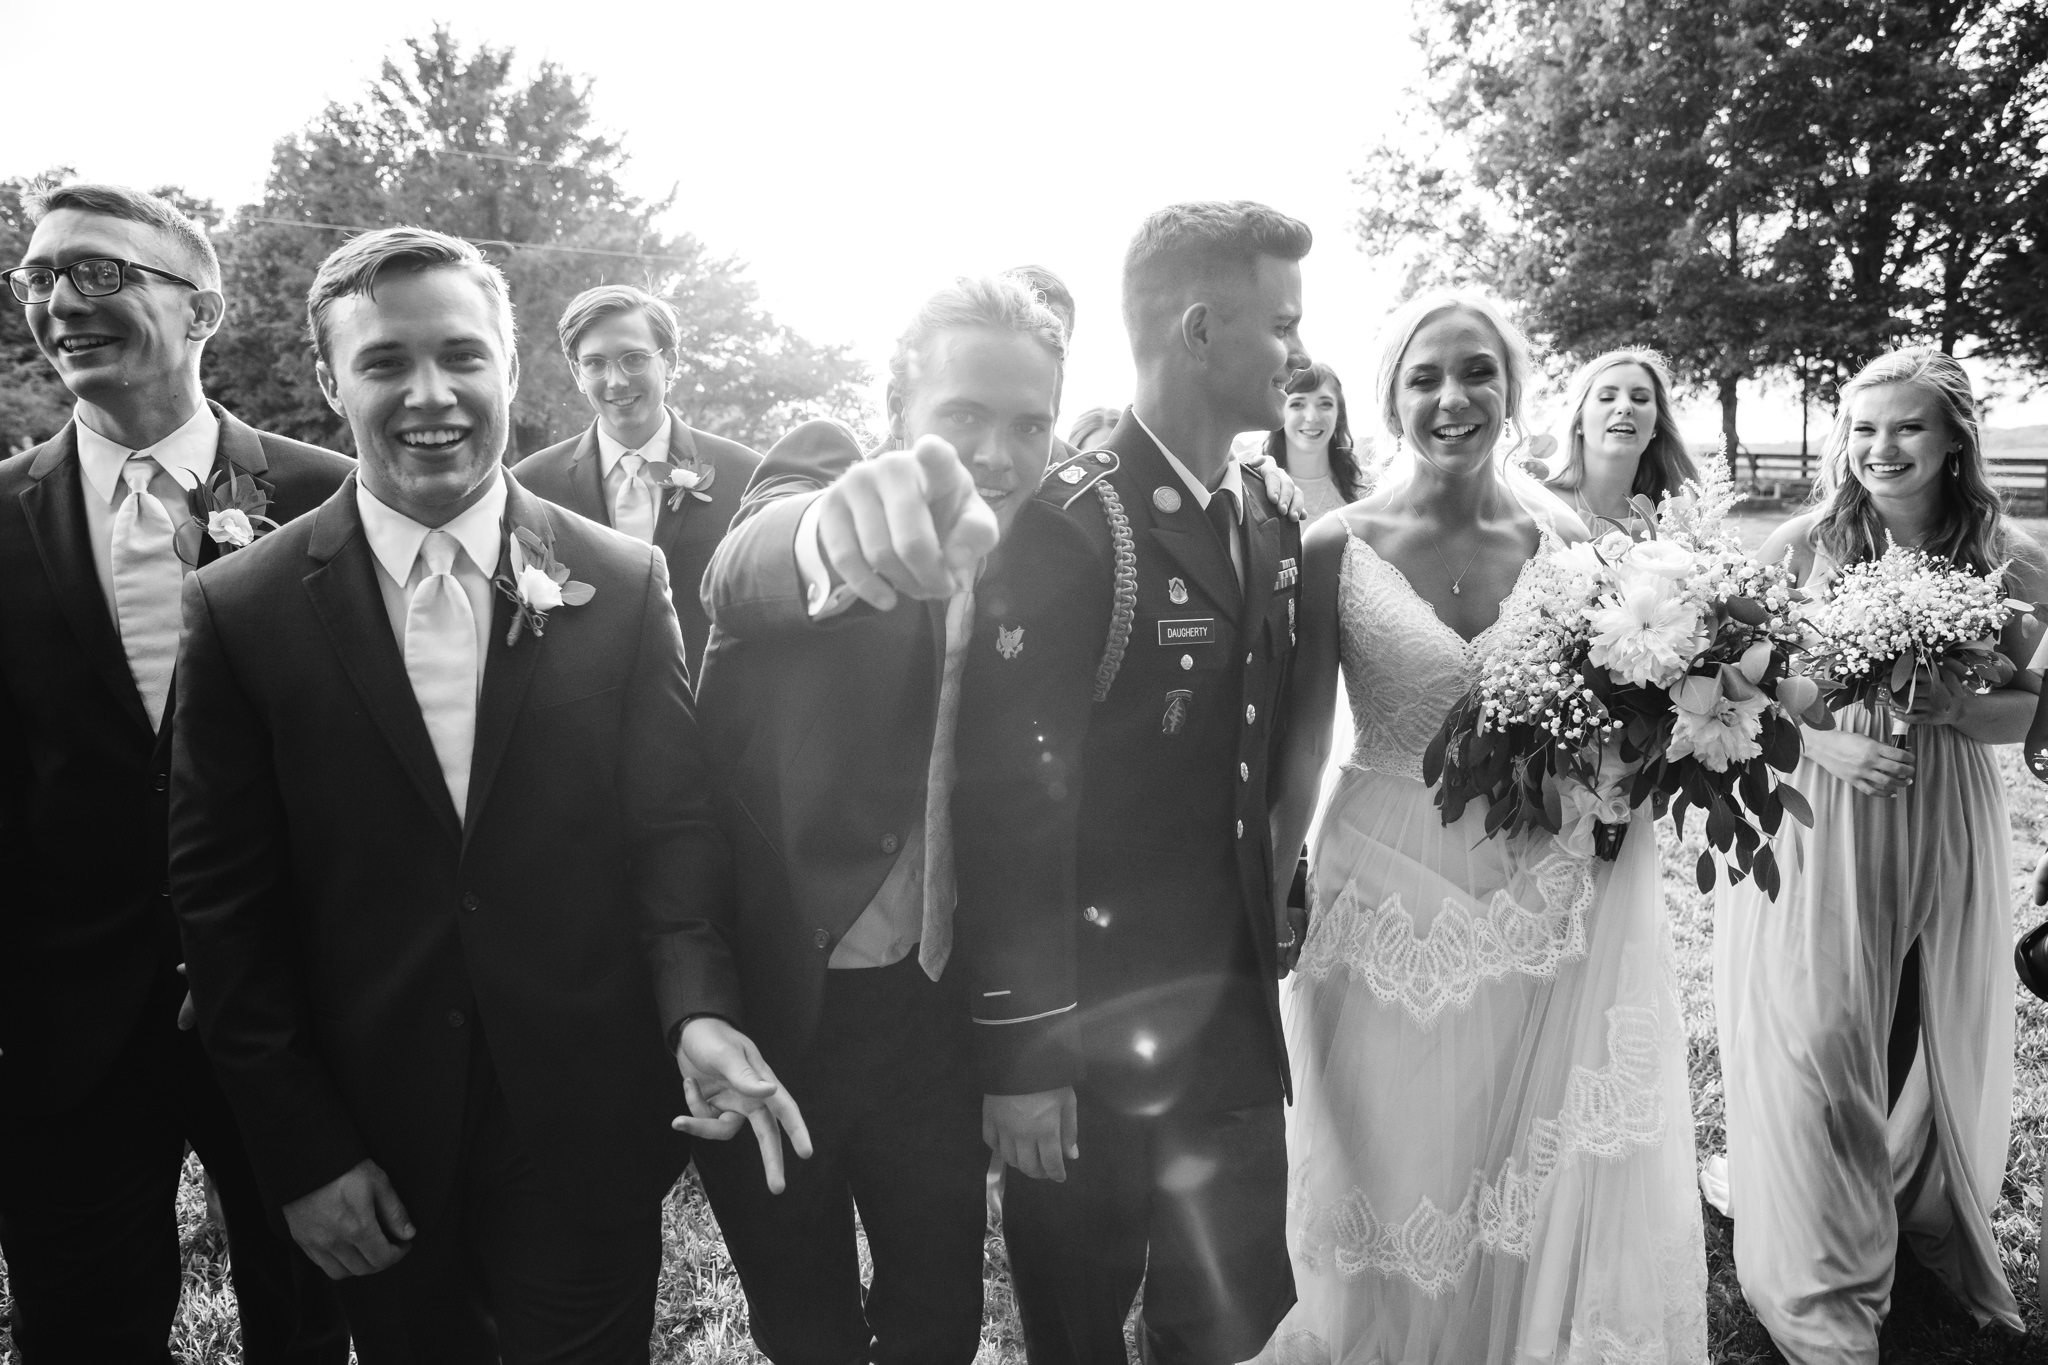 backyard-wedding-thewarmtharoundyou-lexy-branson-63.jpg